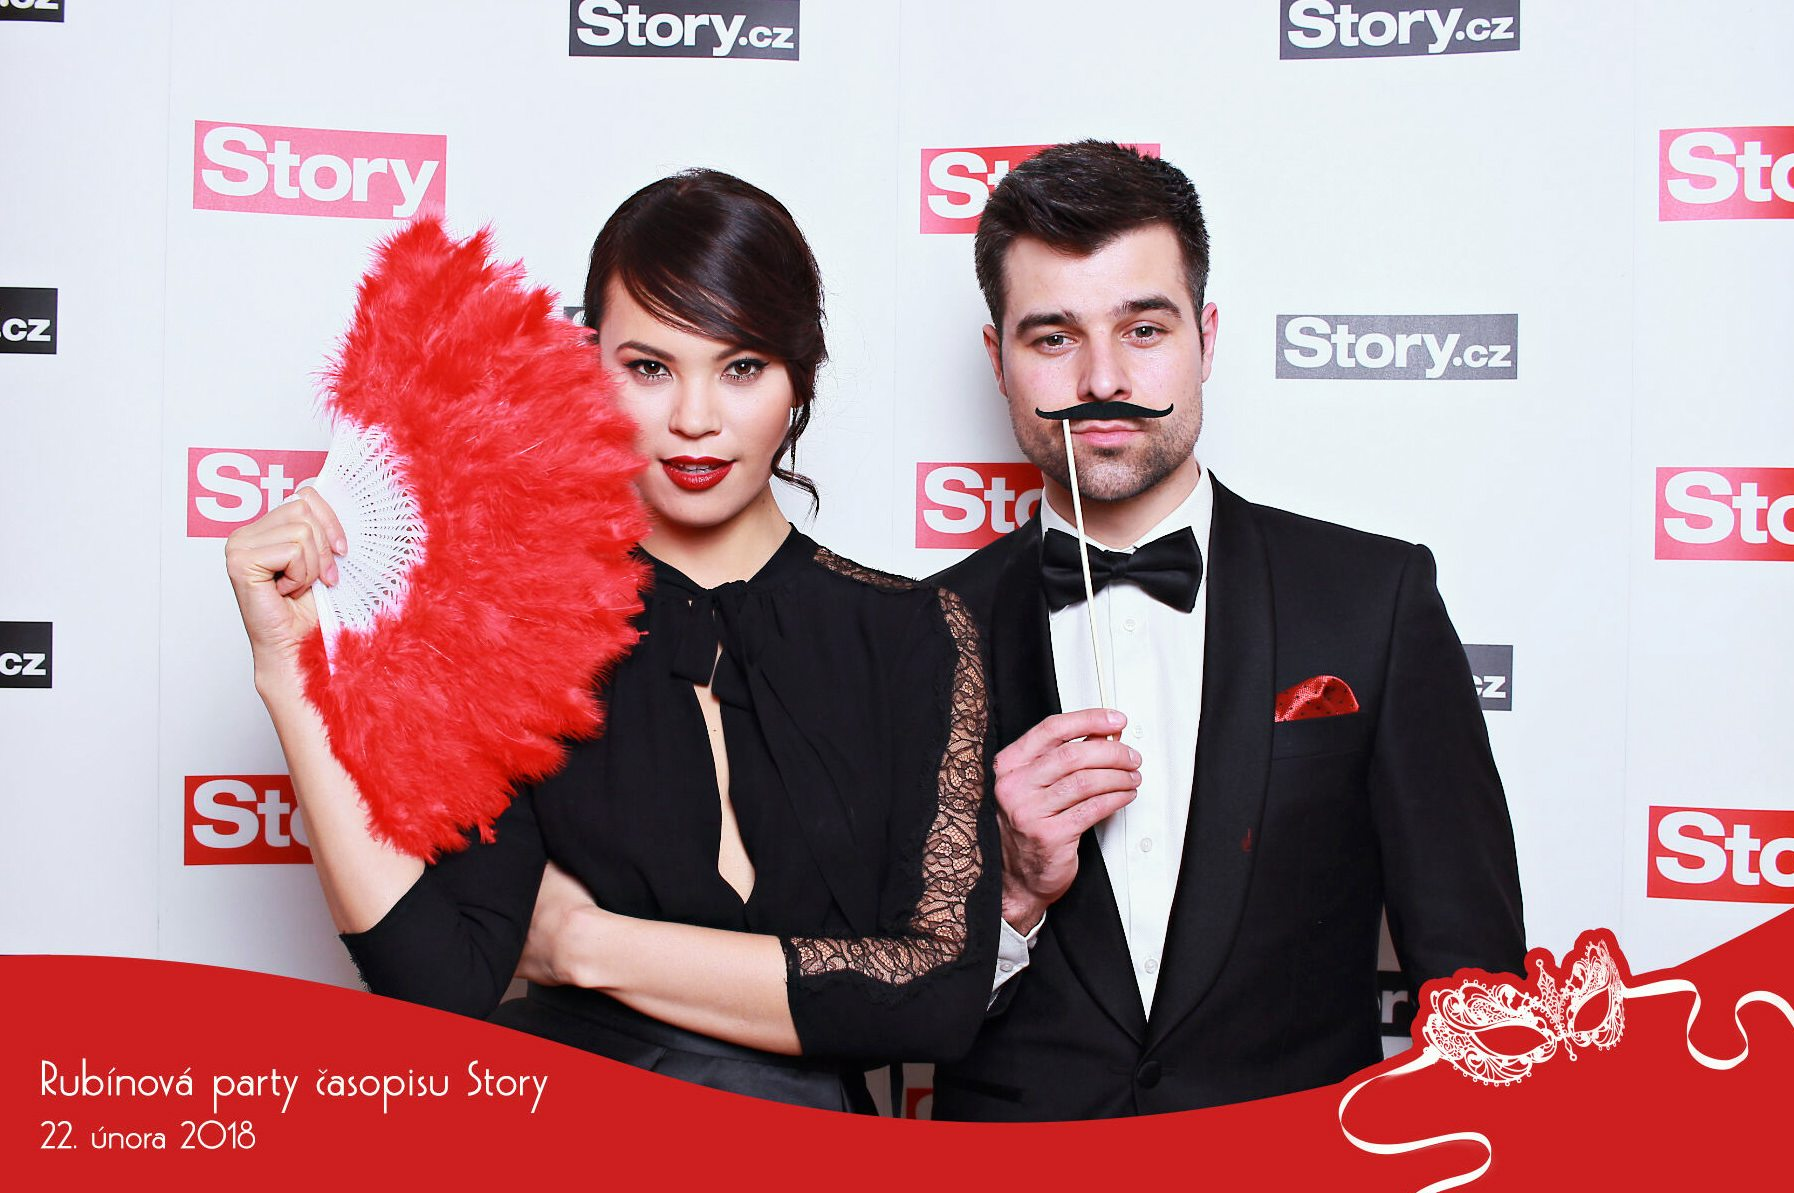 fotokoutek-rubinova-party-casopisu-story-22-2-2018-393273